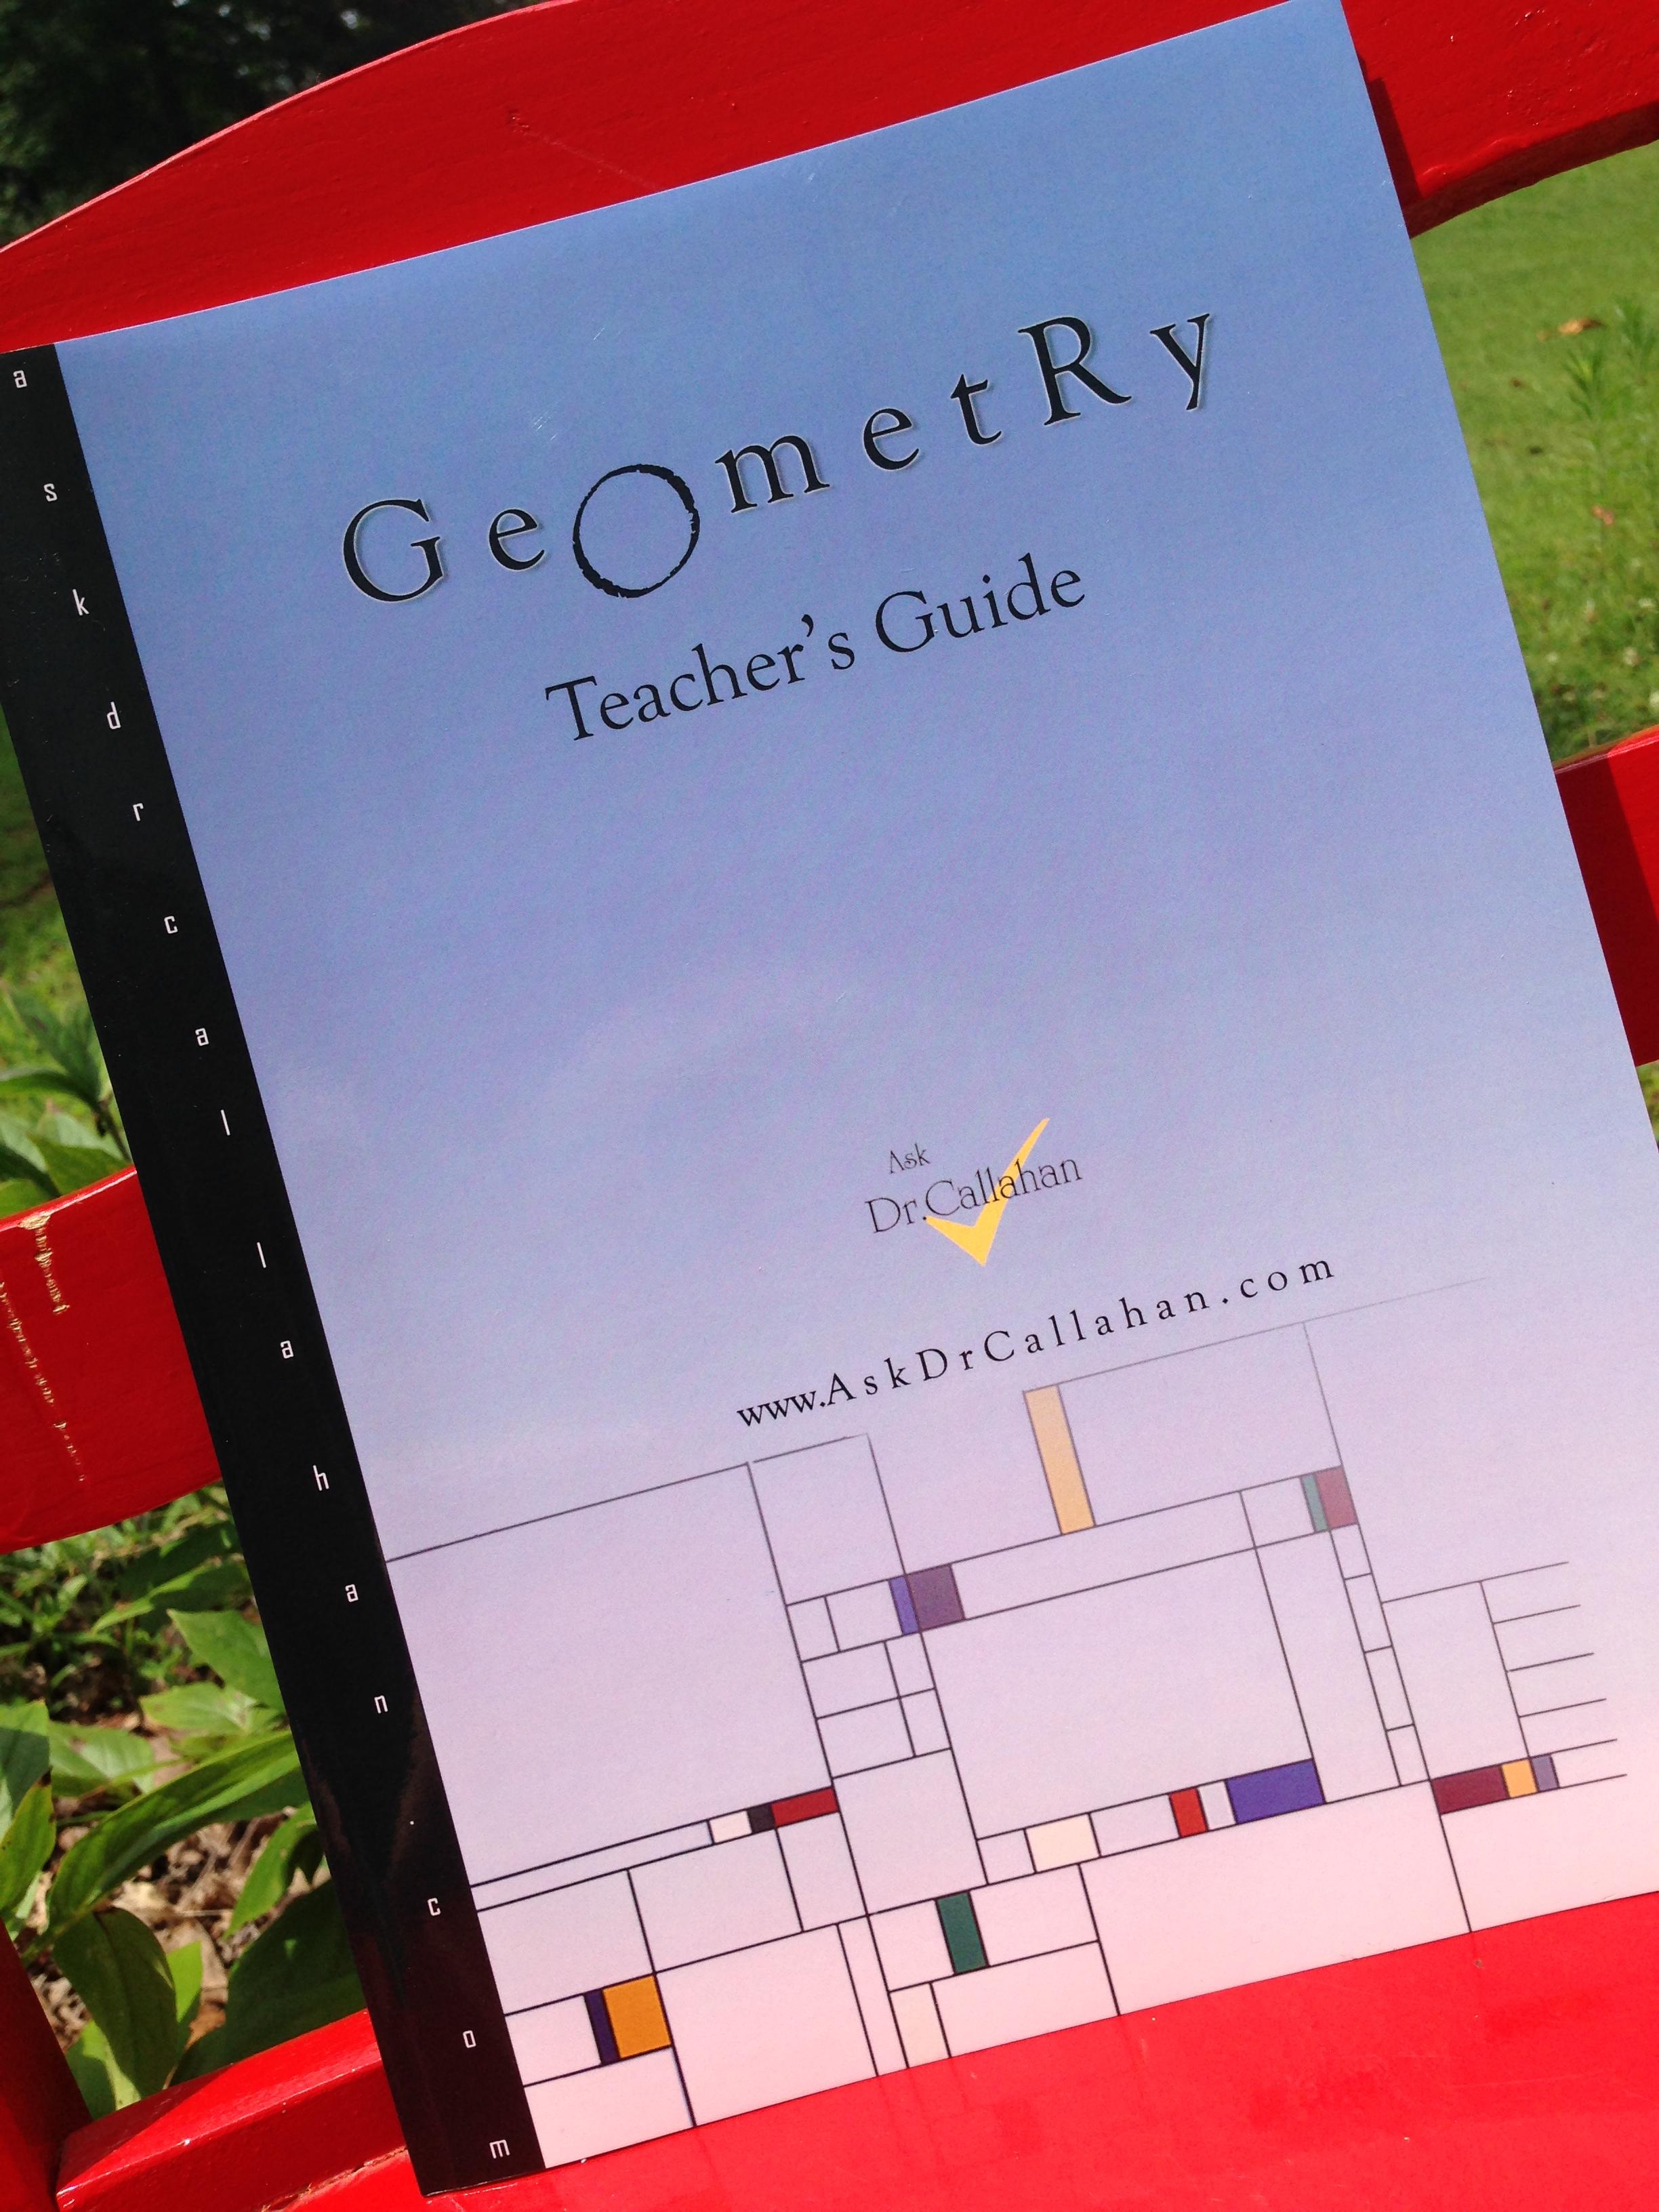 Homeschool geometry - Teacher's Guide for Jacobs Geometry Seeing, Doing, Understanding